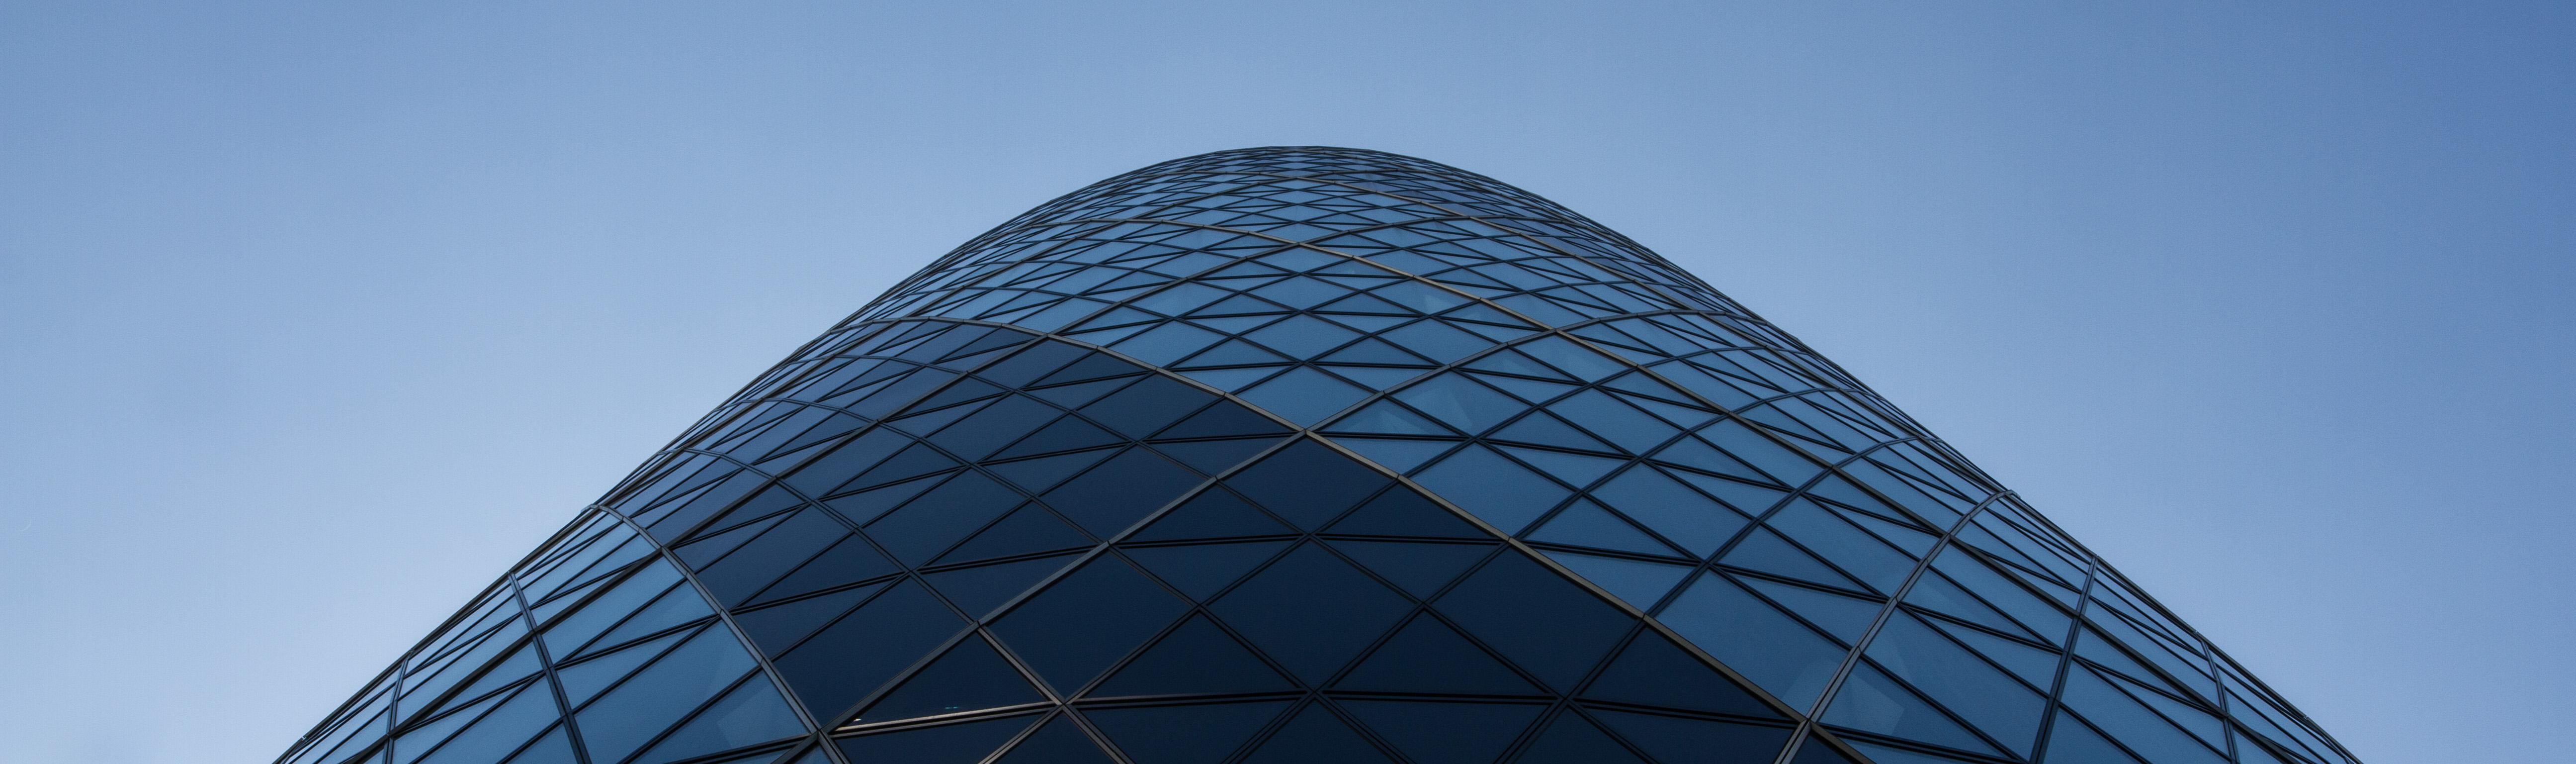 The Gherkin - London